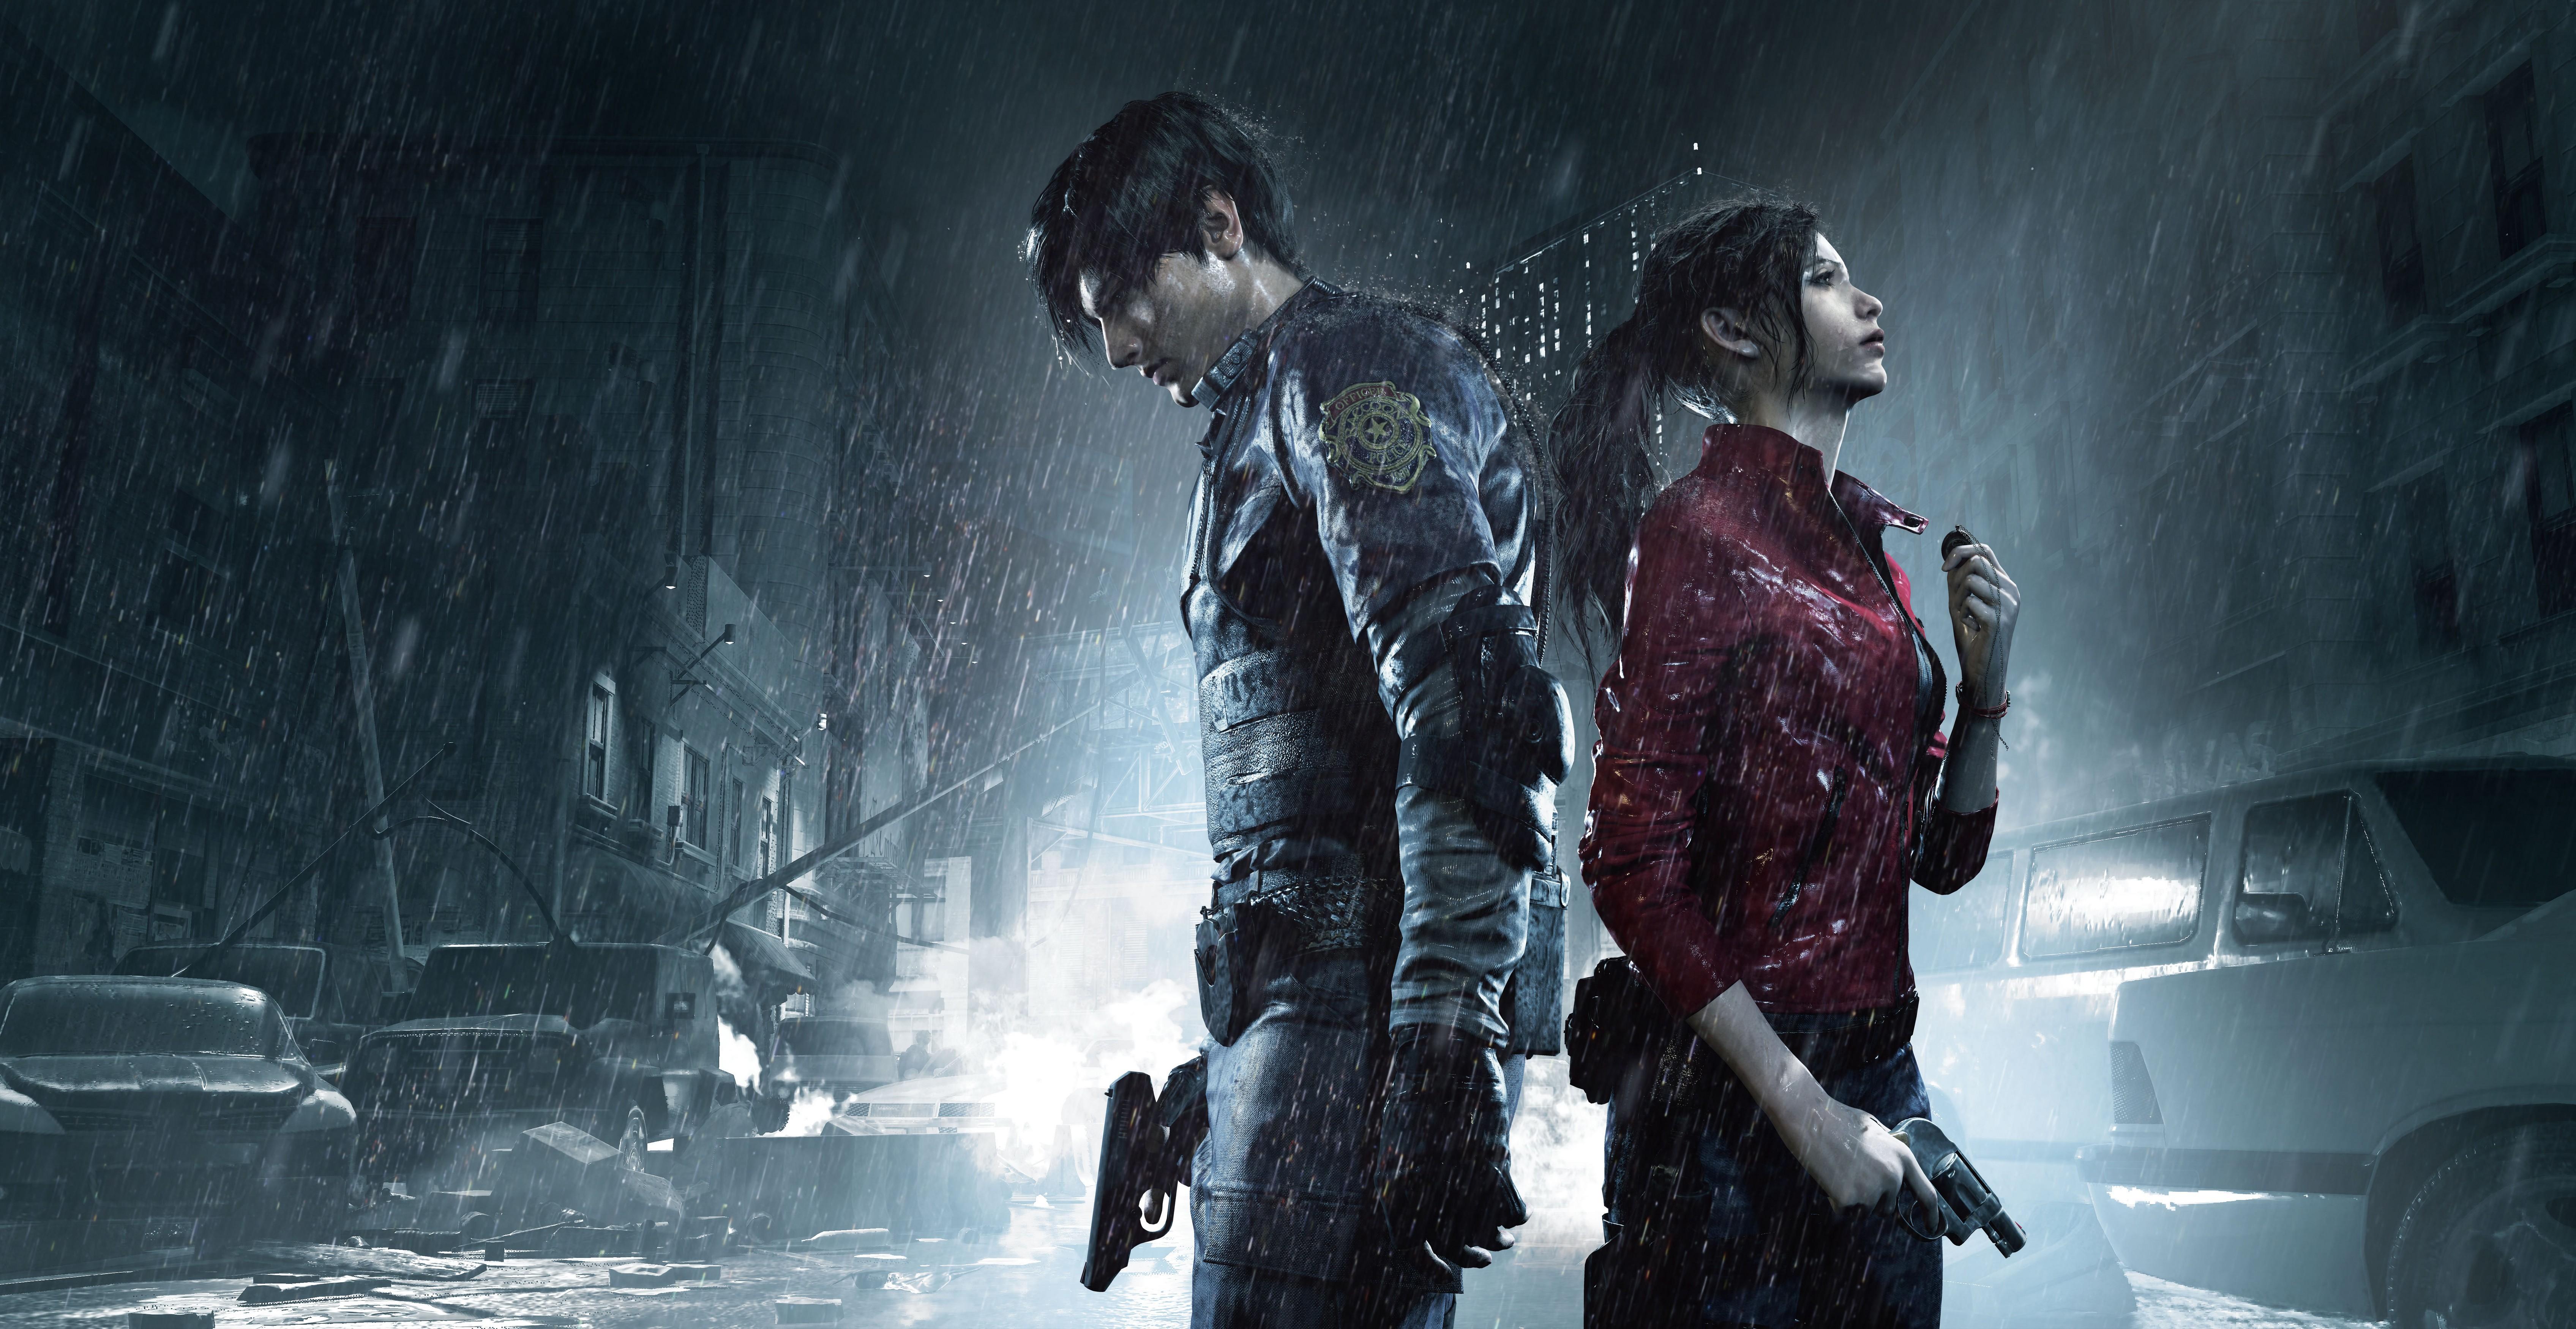 Resident Evil 2 2019 4k Hd Games 4k Wallpapers Images